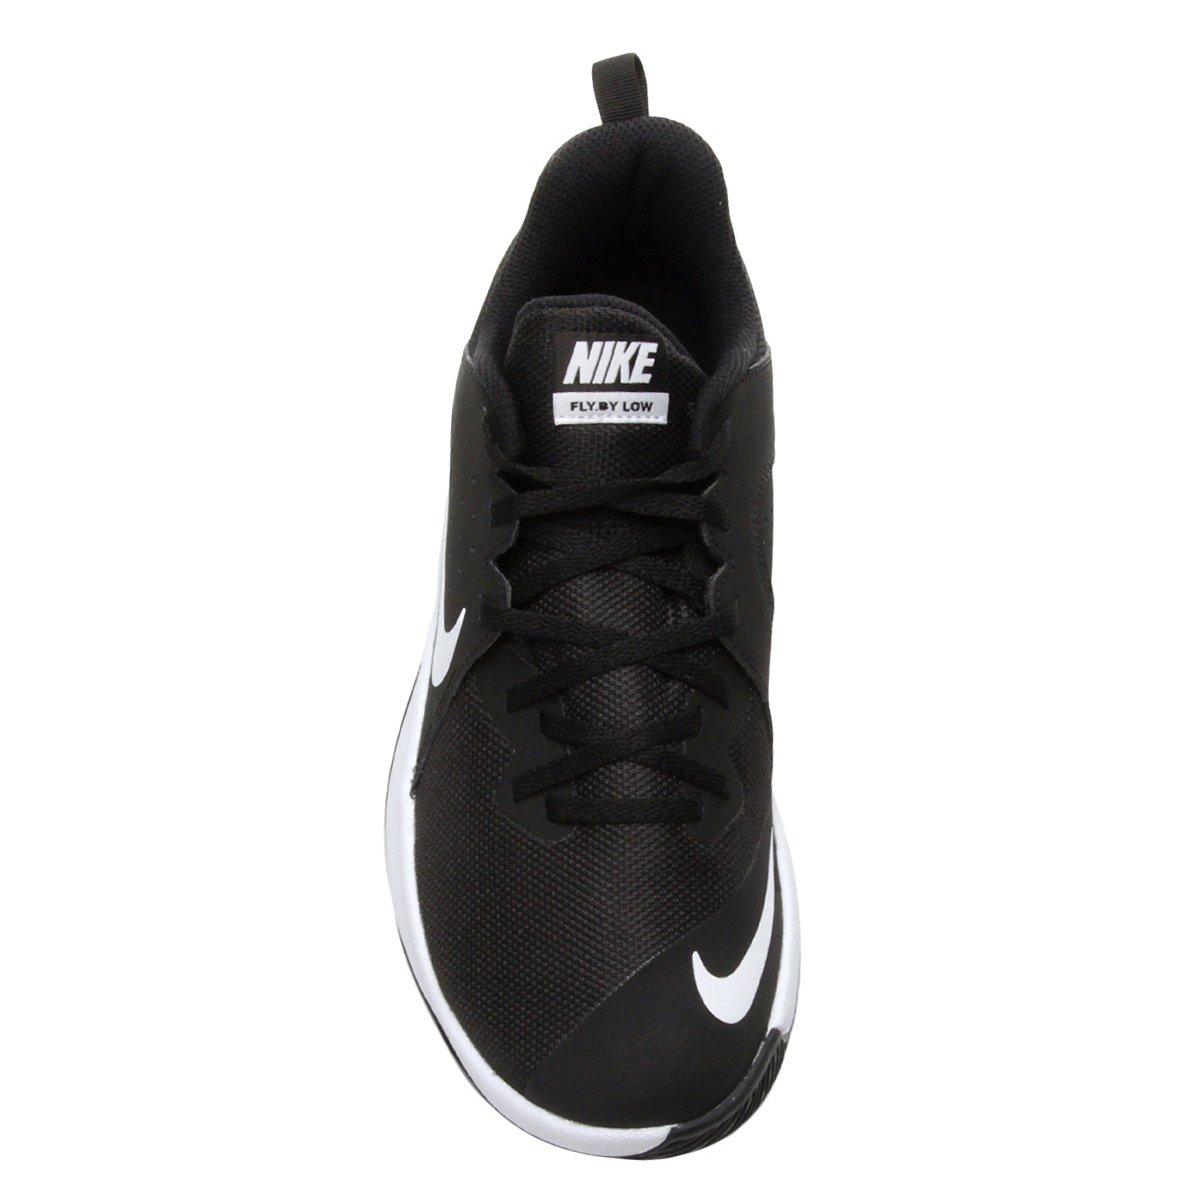 Tênis Nike Fly.By Low Masculino - 2